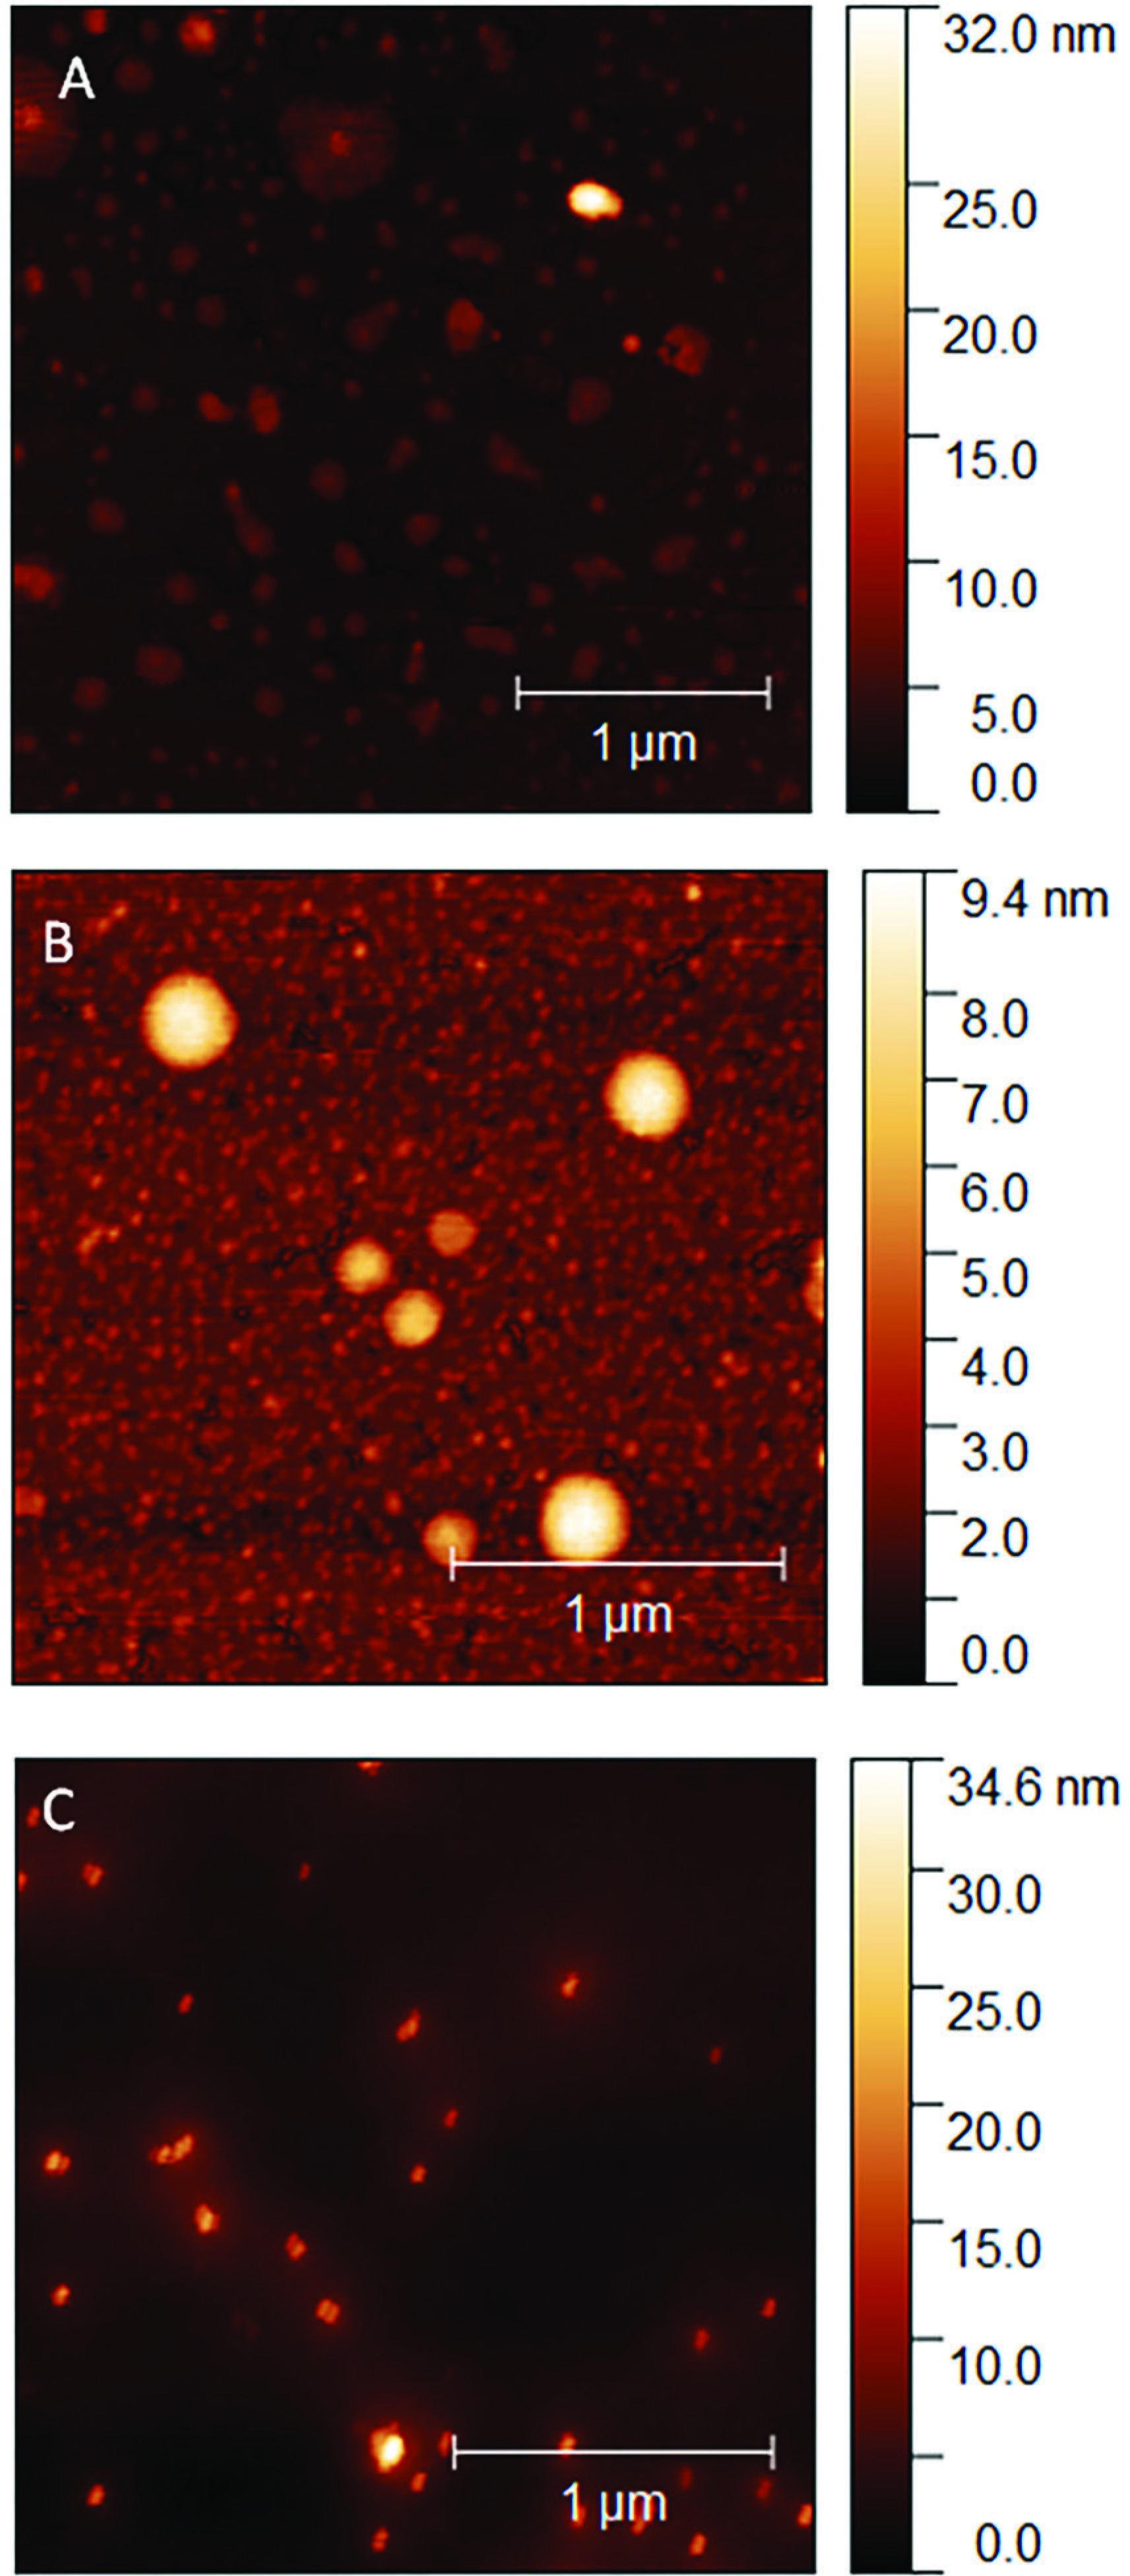 Atomic force spectroscopy analysis Ag NP (A), AgPVP (B), Ag 10% + polymer (C)